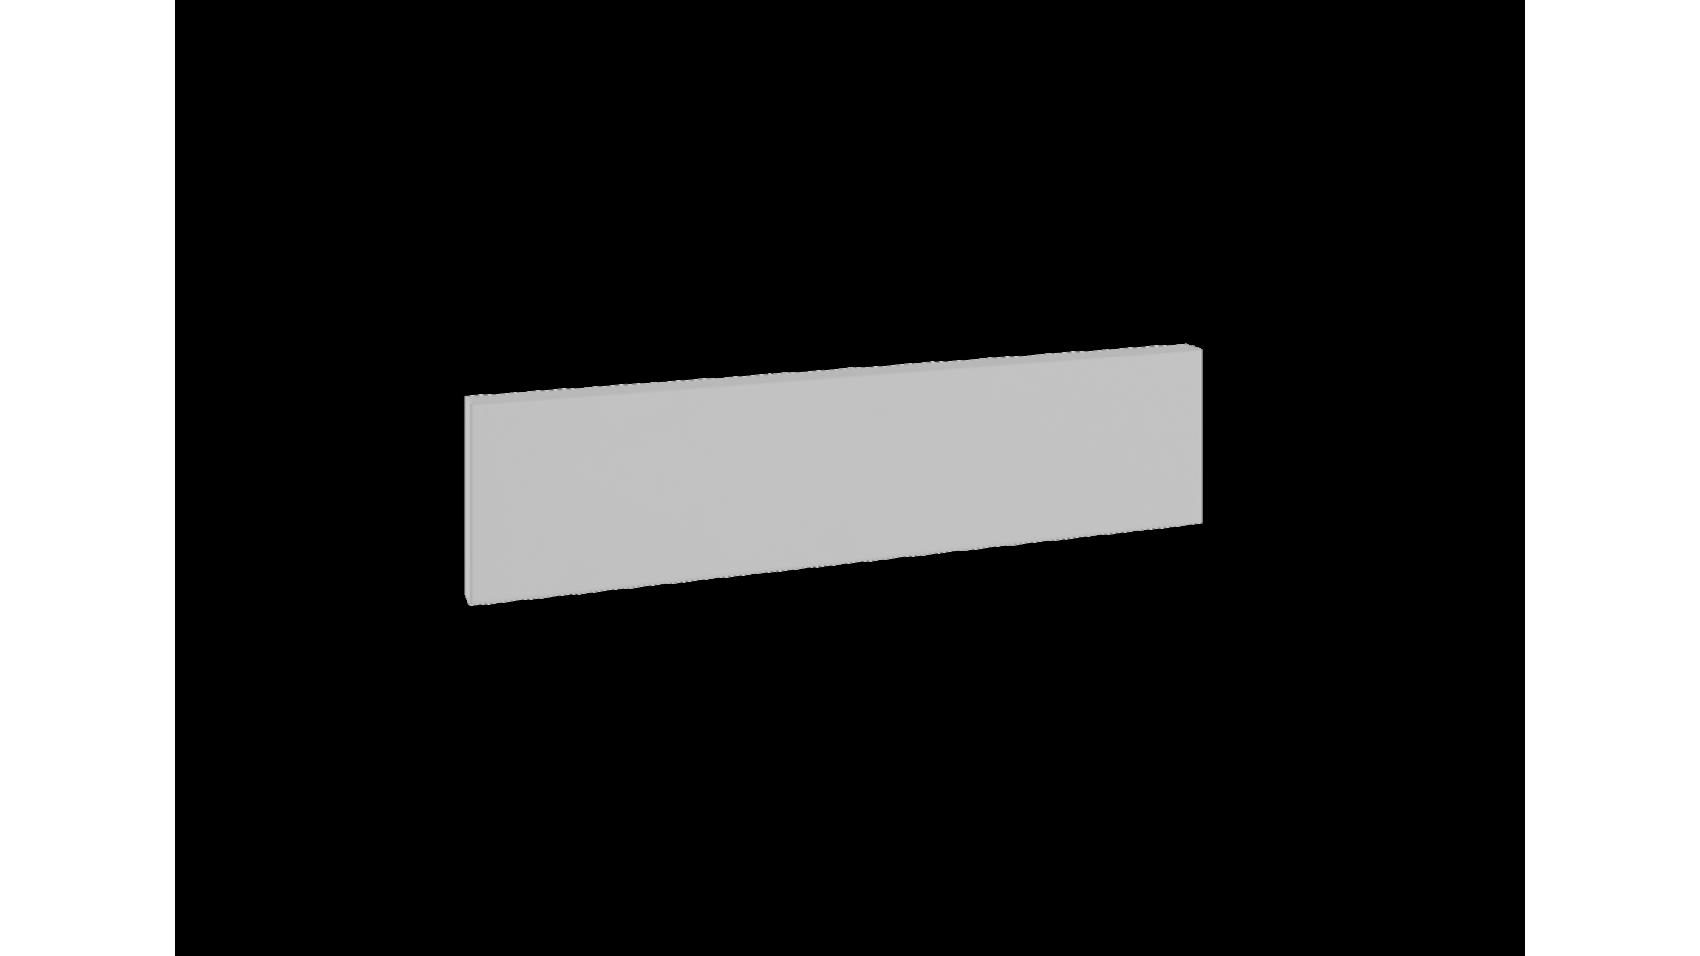 Kuchenne Elementy Dodatkowe Milano Nube | sklep internetowy Lupus ECO